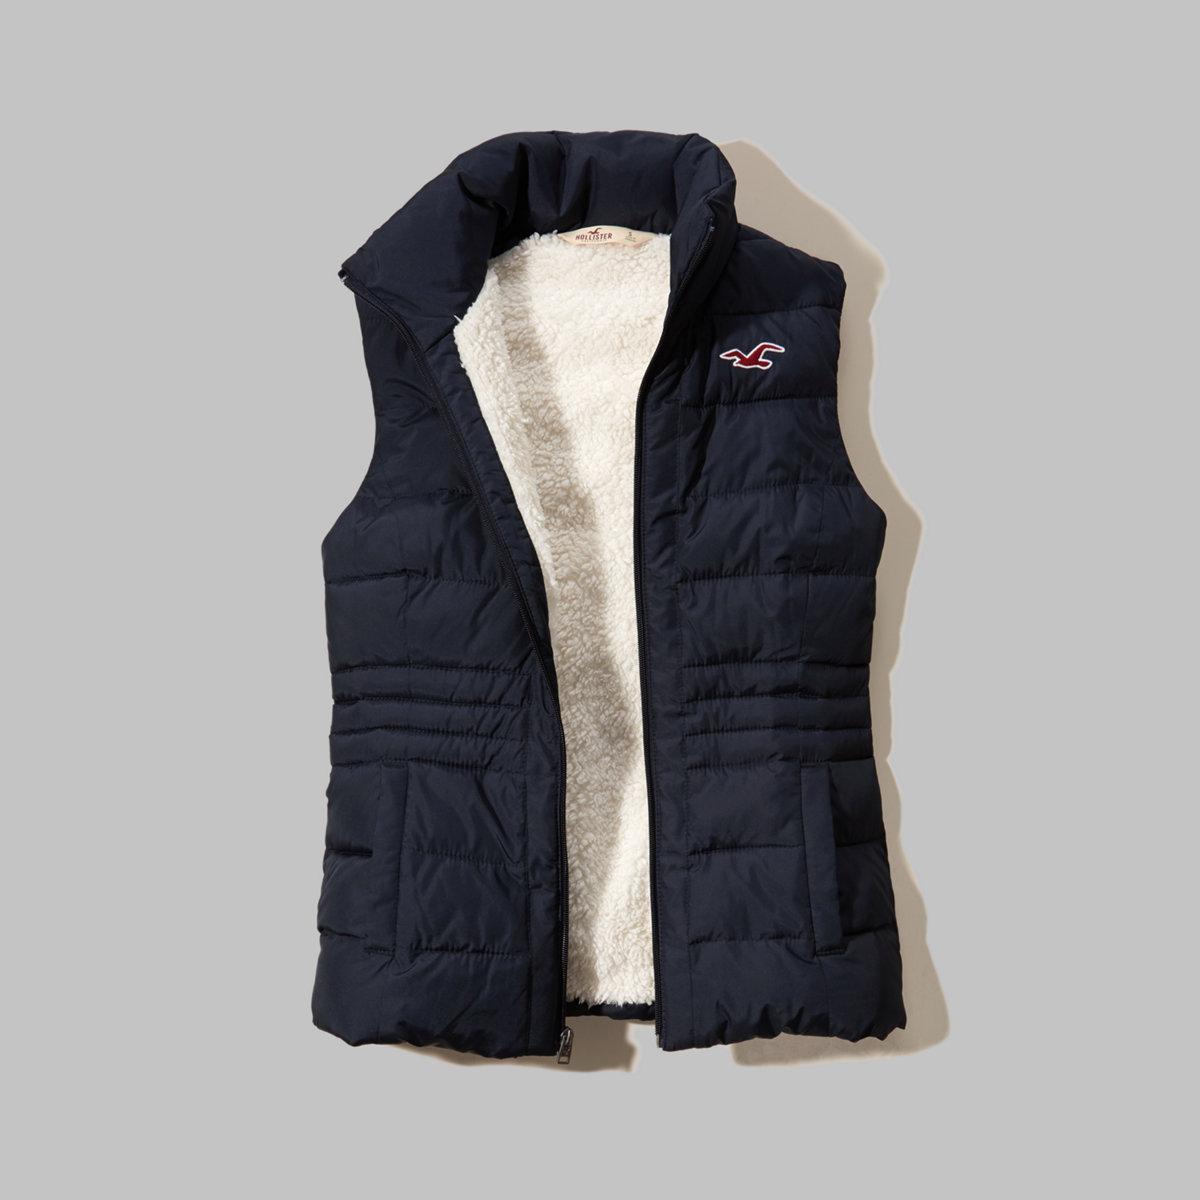 Hollister Sherpa Lined Puffer Vest